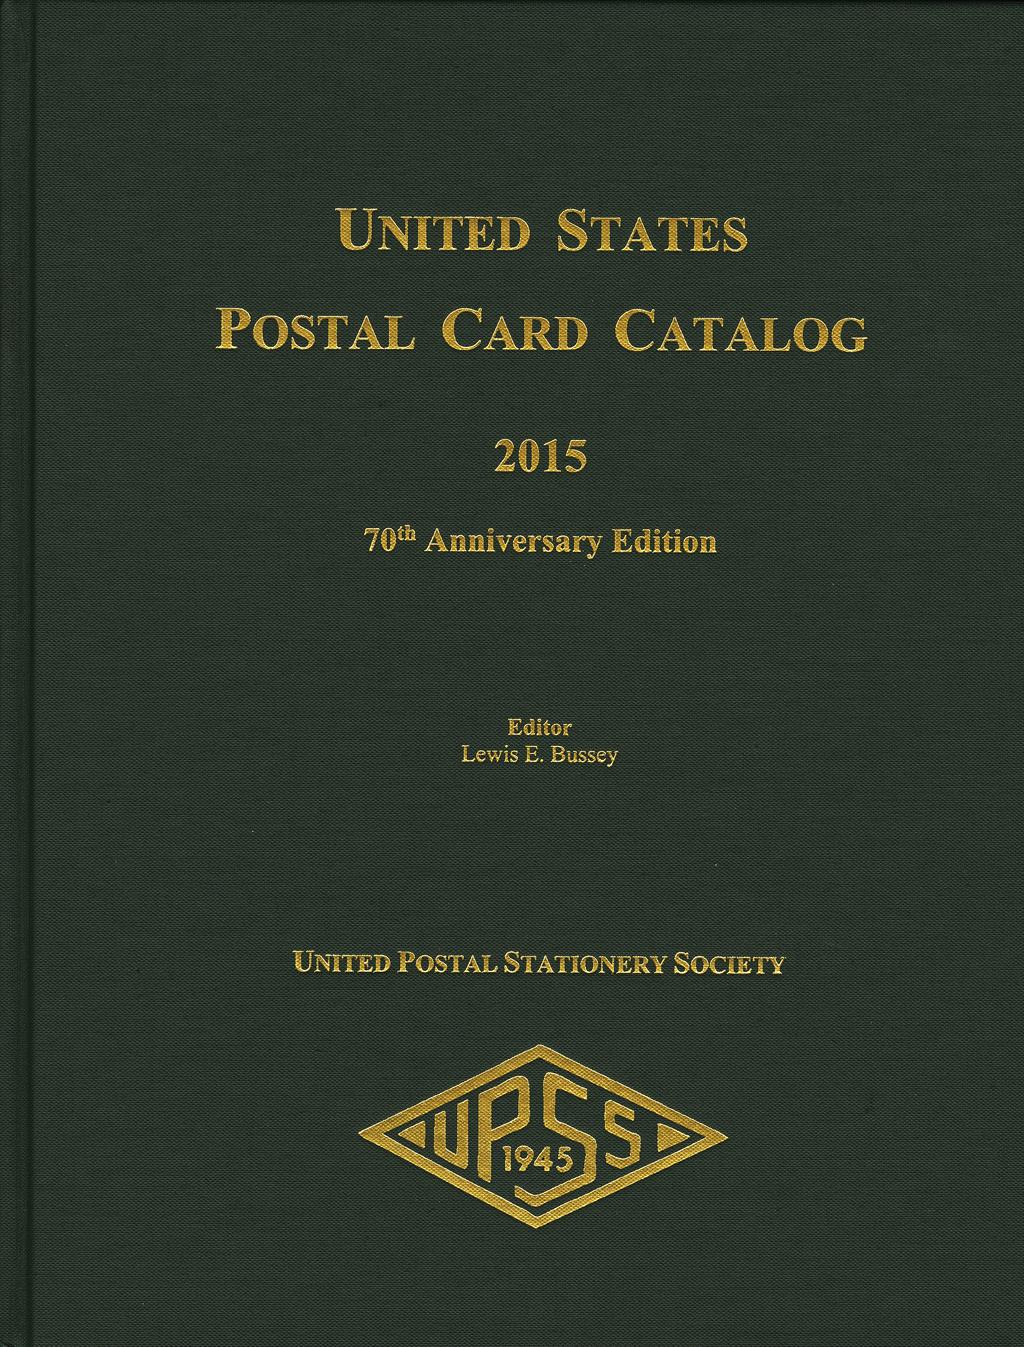 edi-dh-postalcardcat-f1